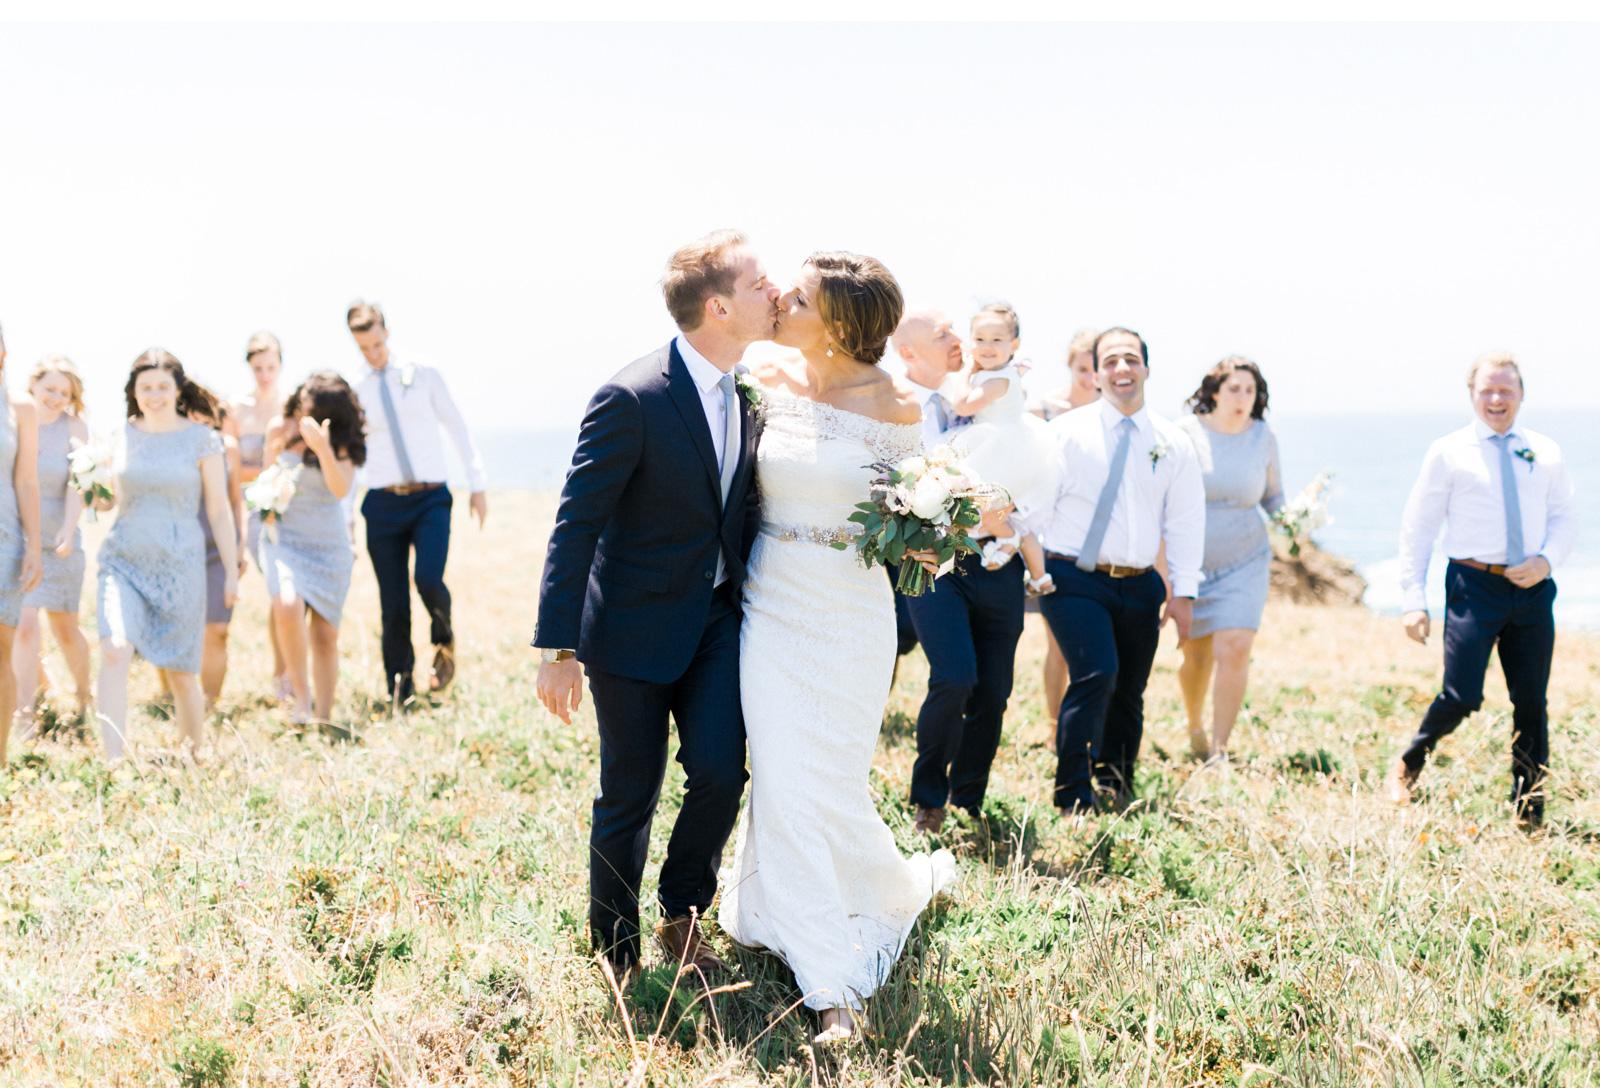 Mendocino-wedding-photographer-natalie-schutt-photography_18.jpg